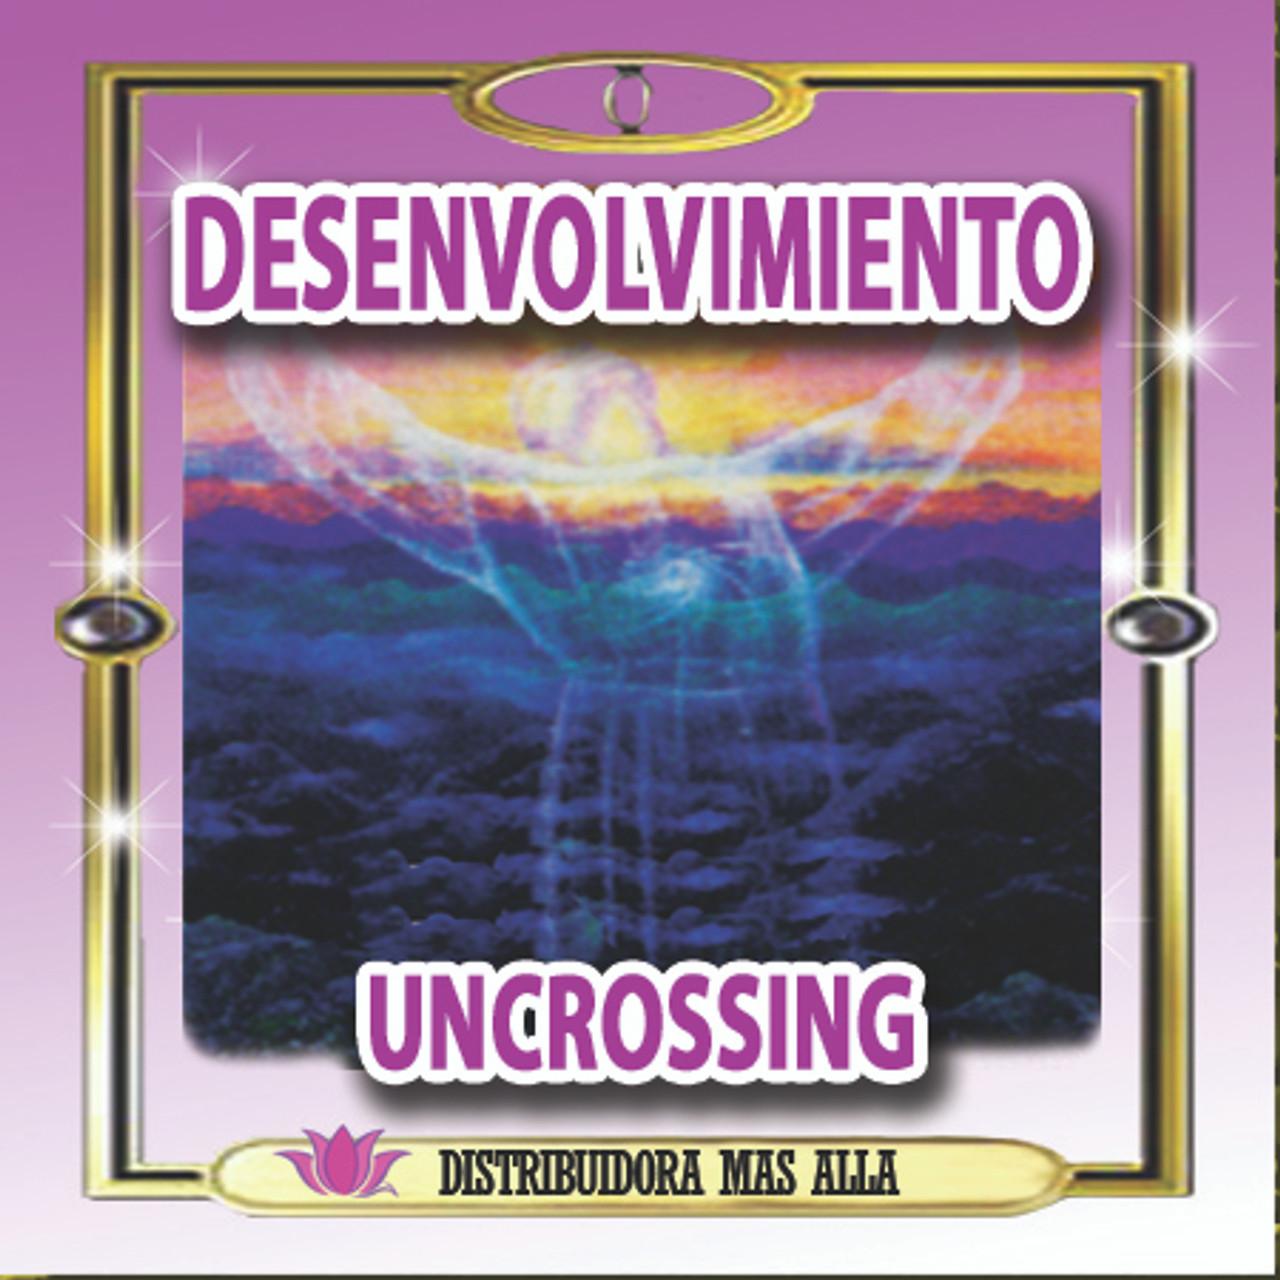 Aceite Desemvolvimiento - Uncrossing Powder